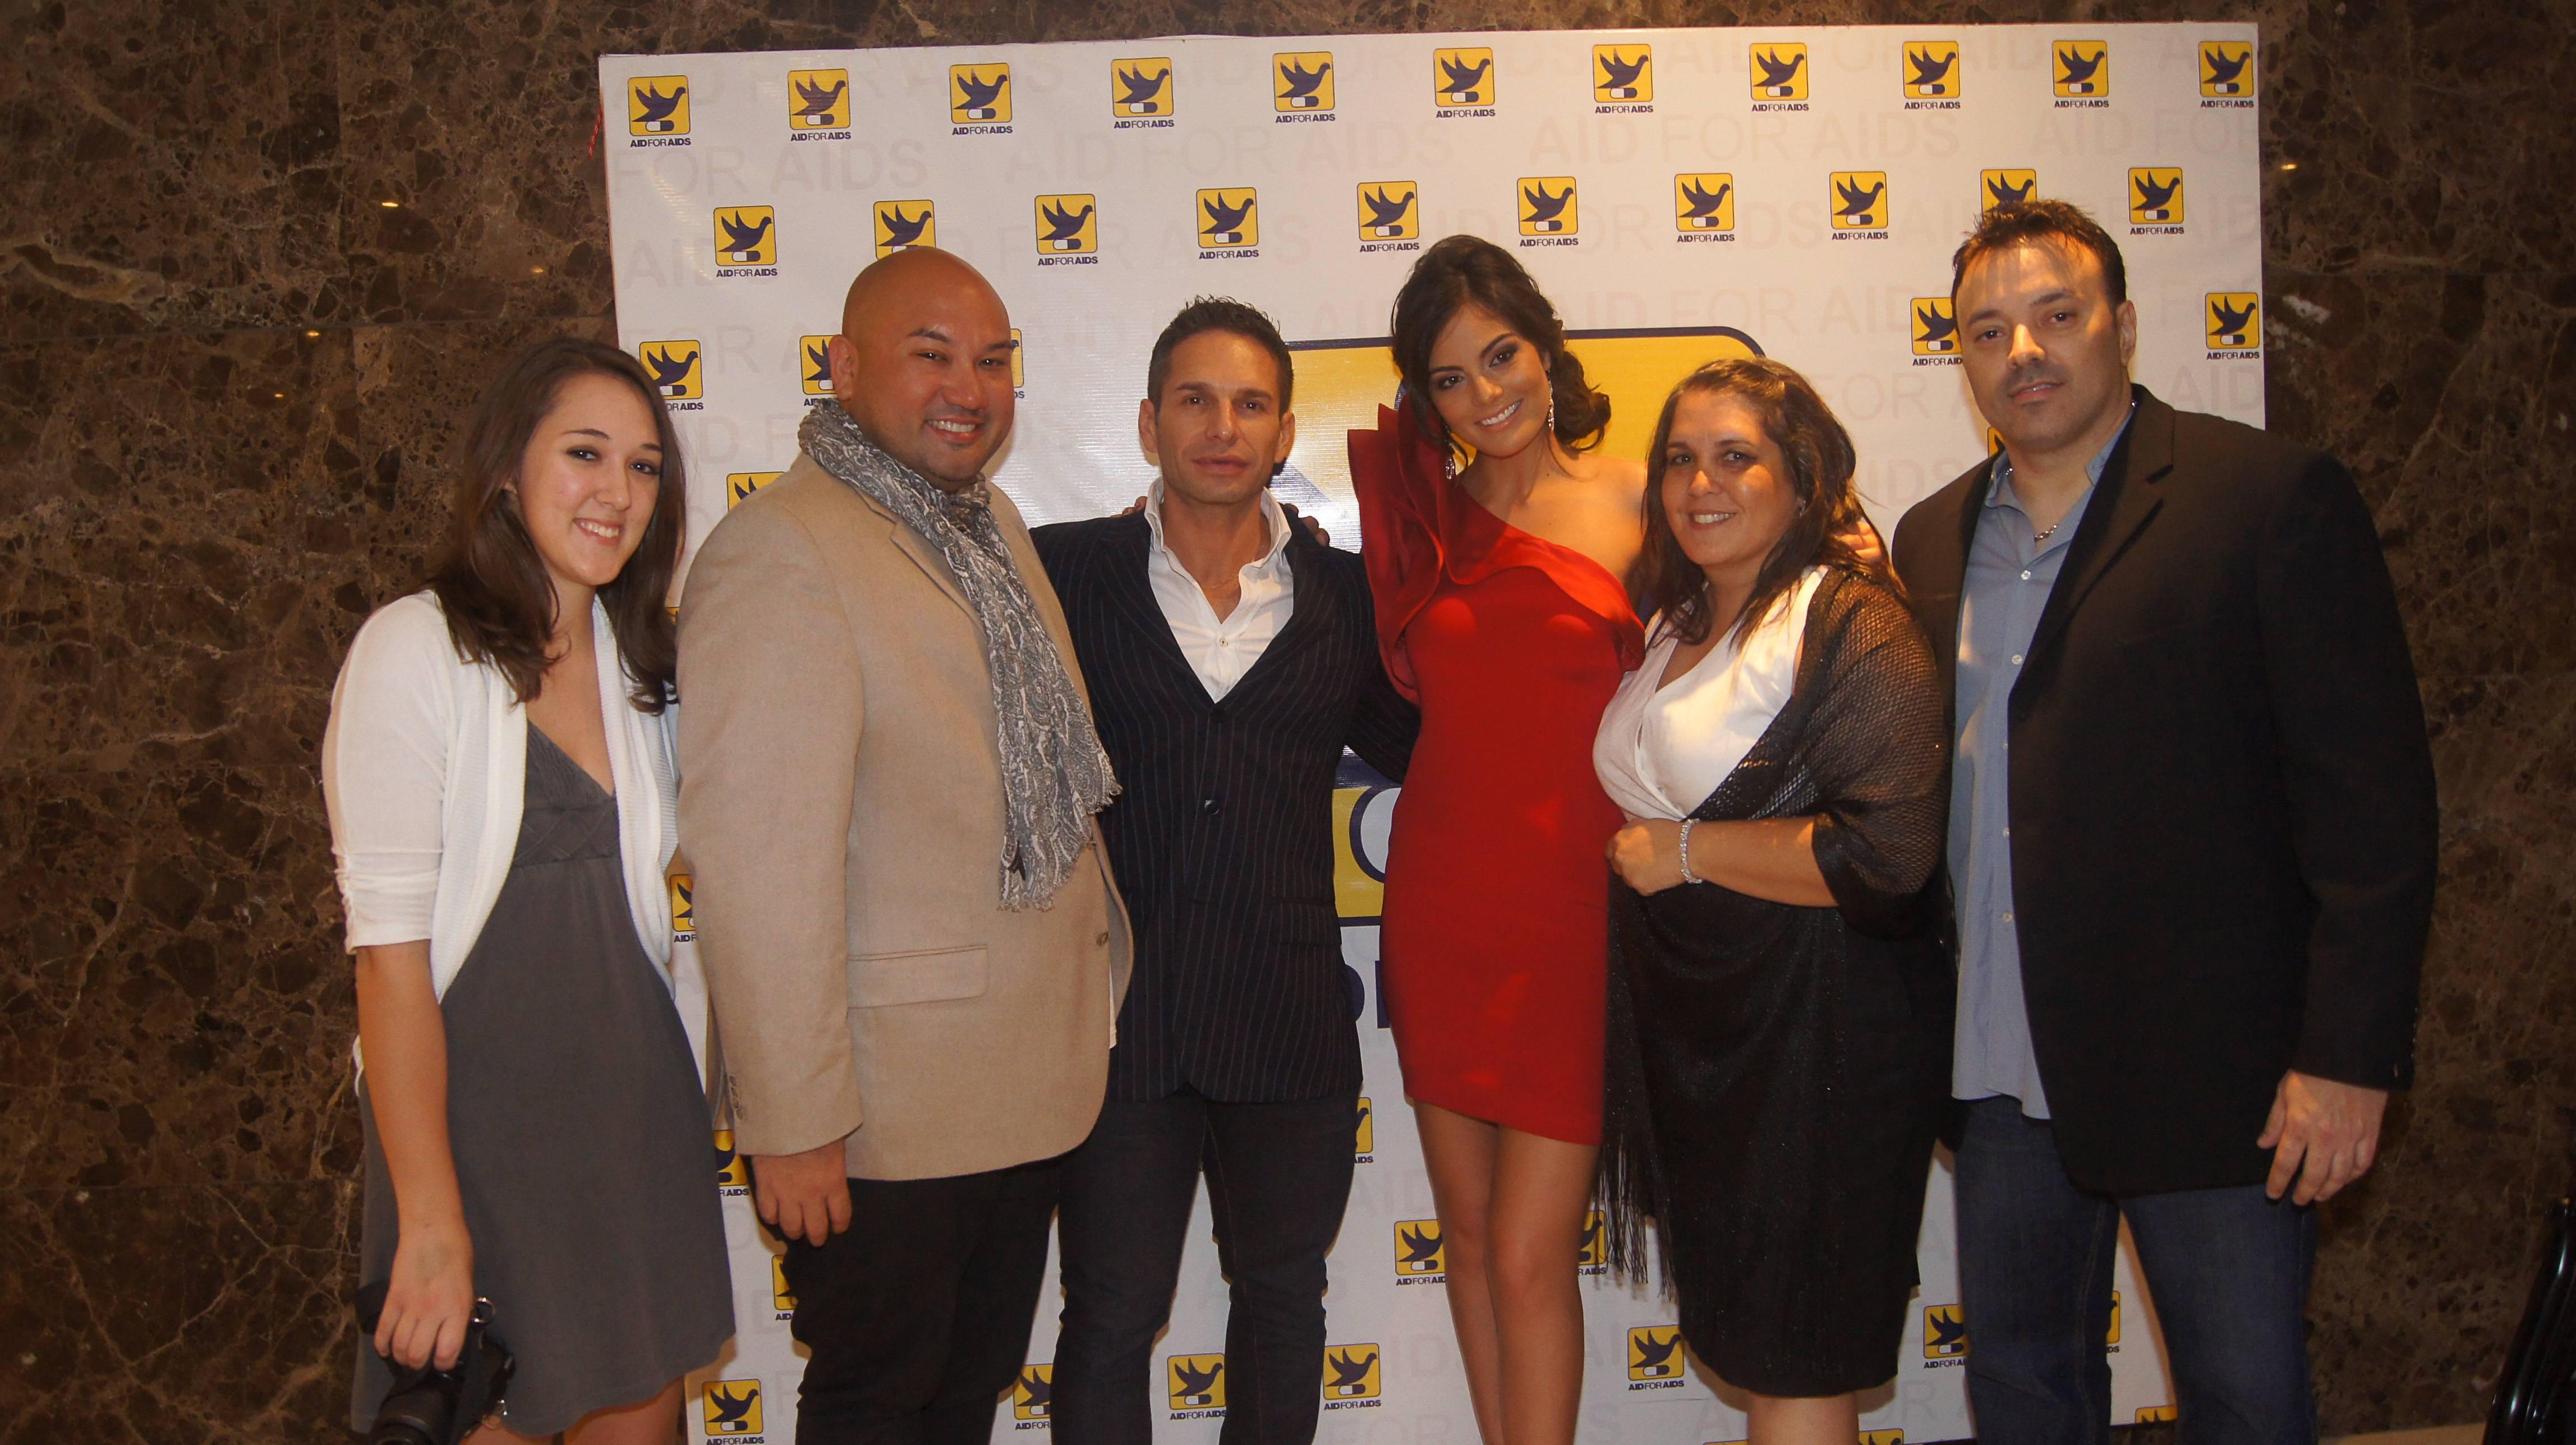 Noche de Cóctel con Miss Universo 2010